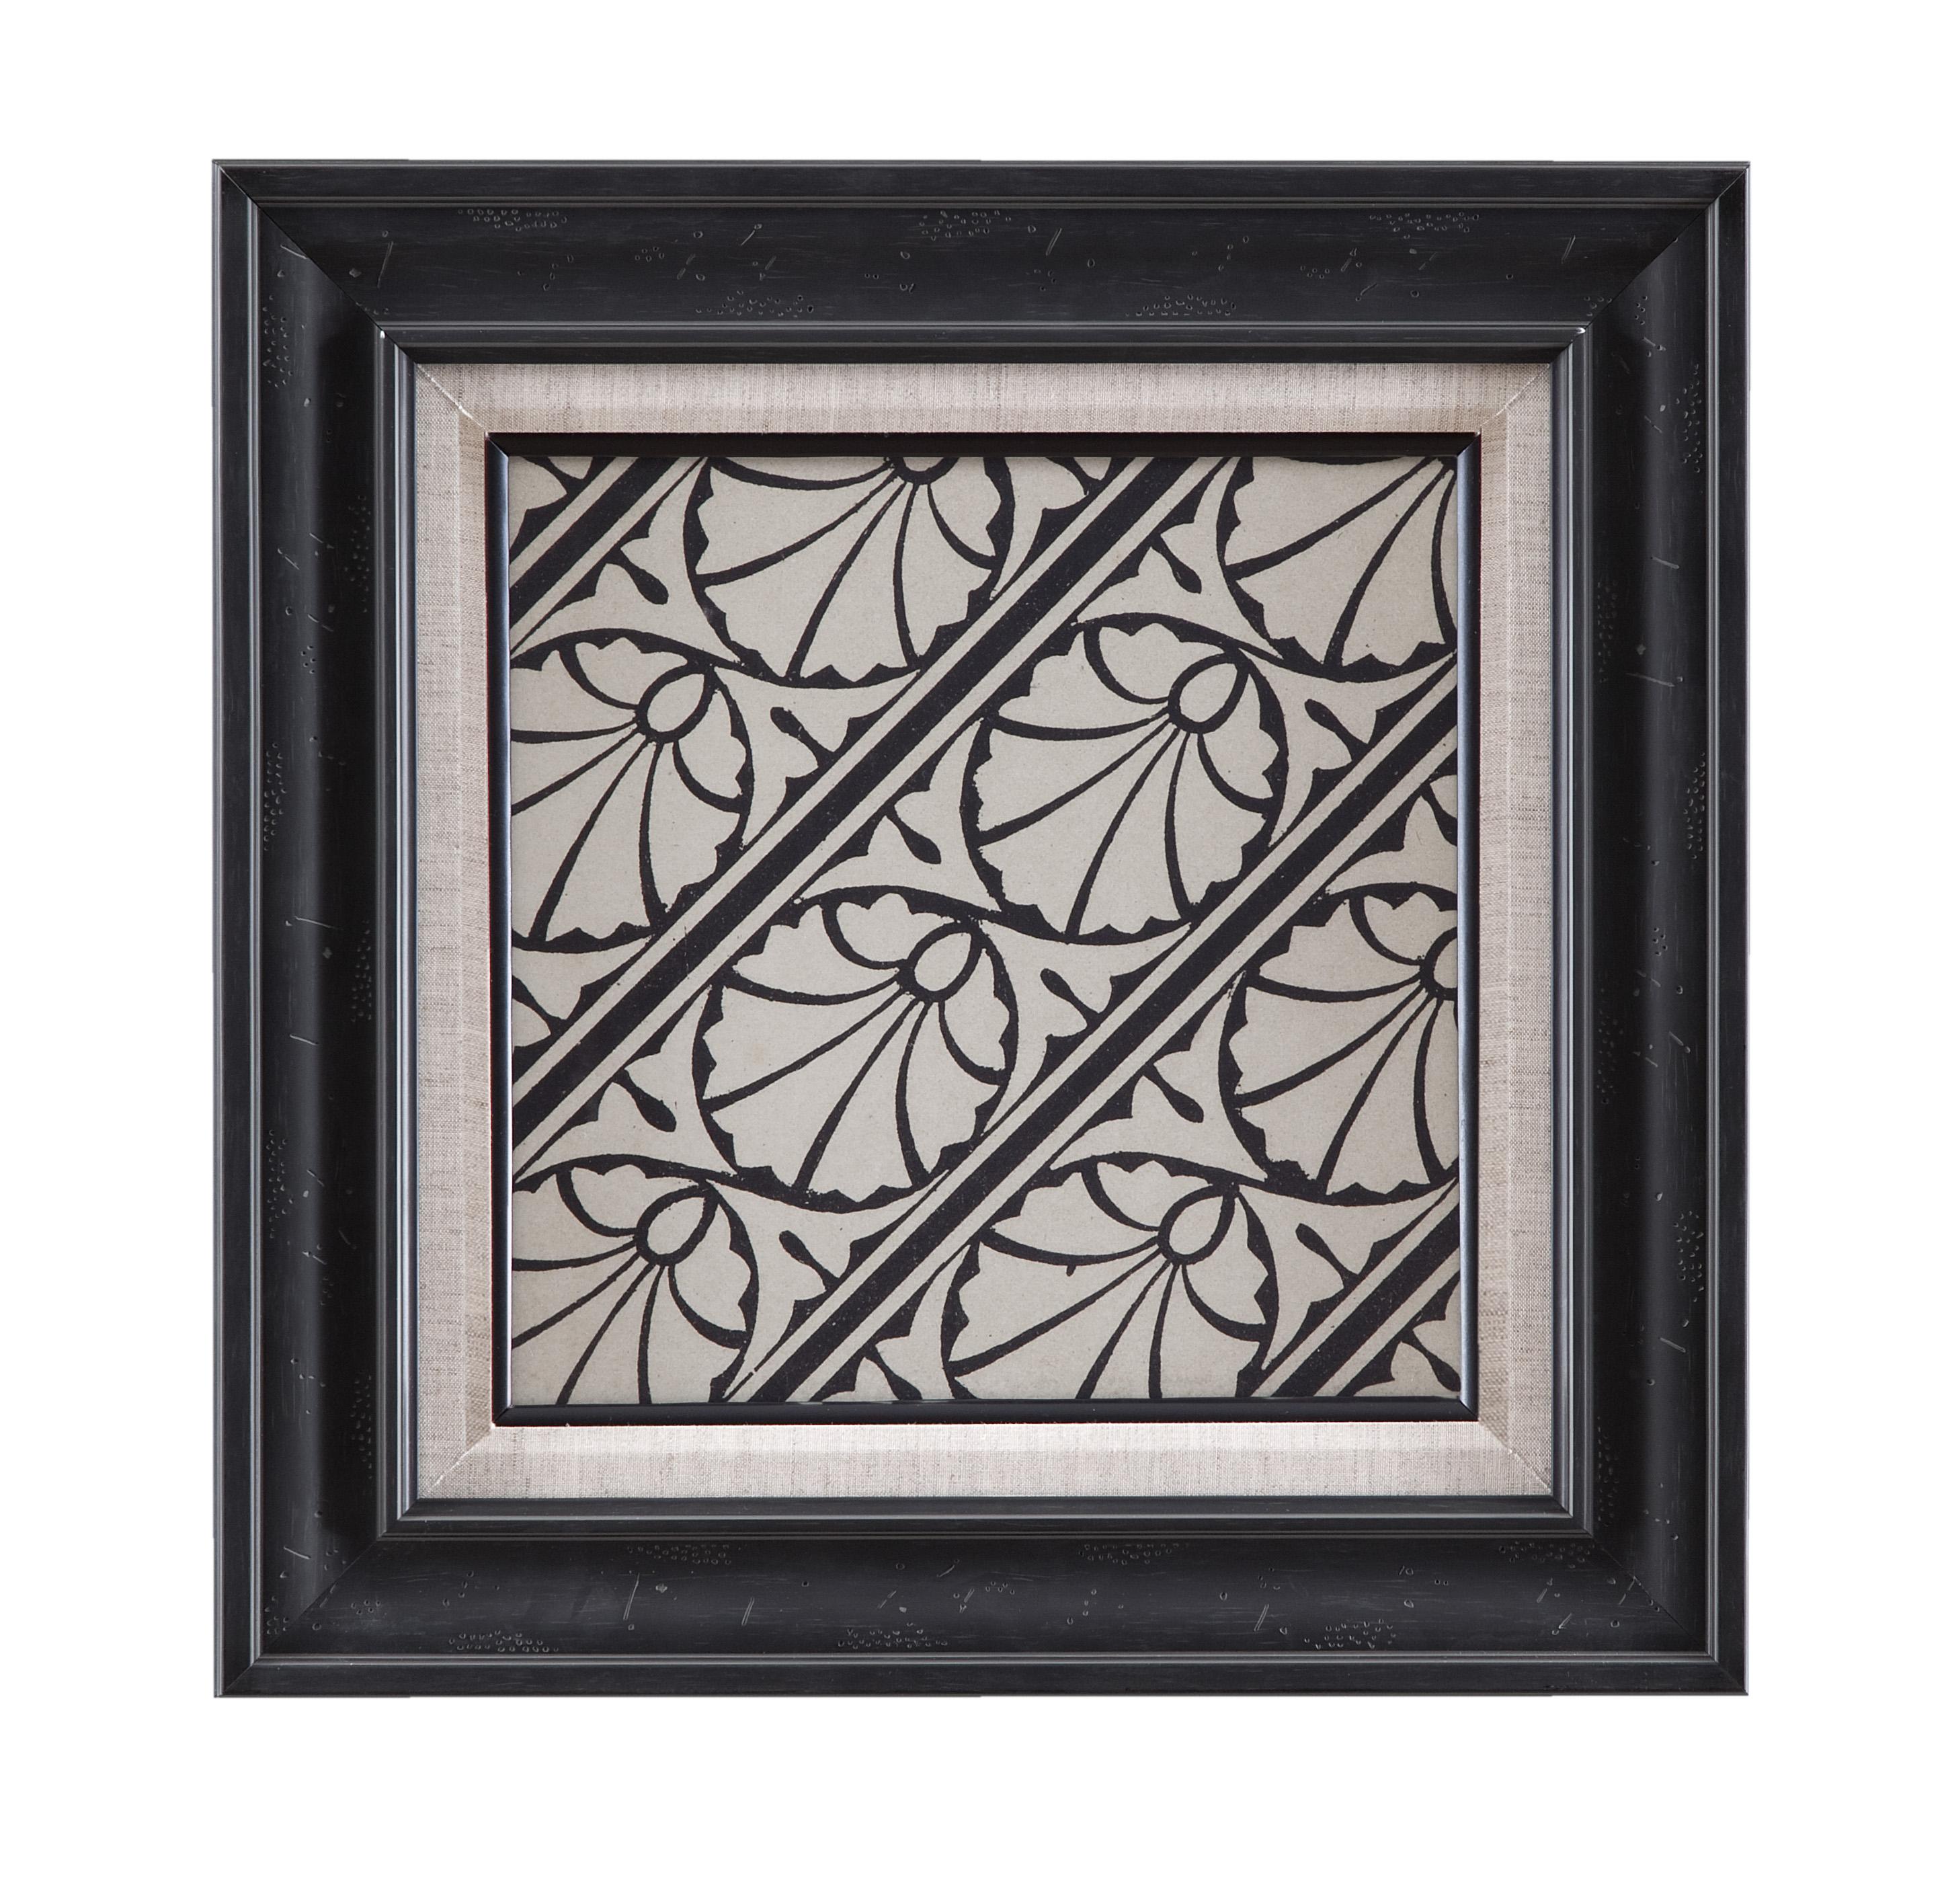 Belgian Luxe Ornamental Tile Motif VI by Bassett Mirror at Alison Craig Home Furnishings